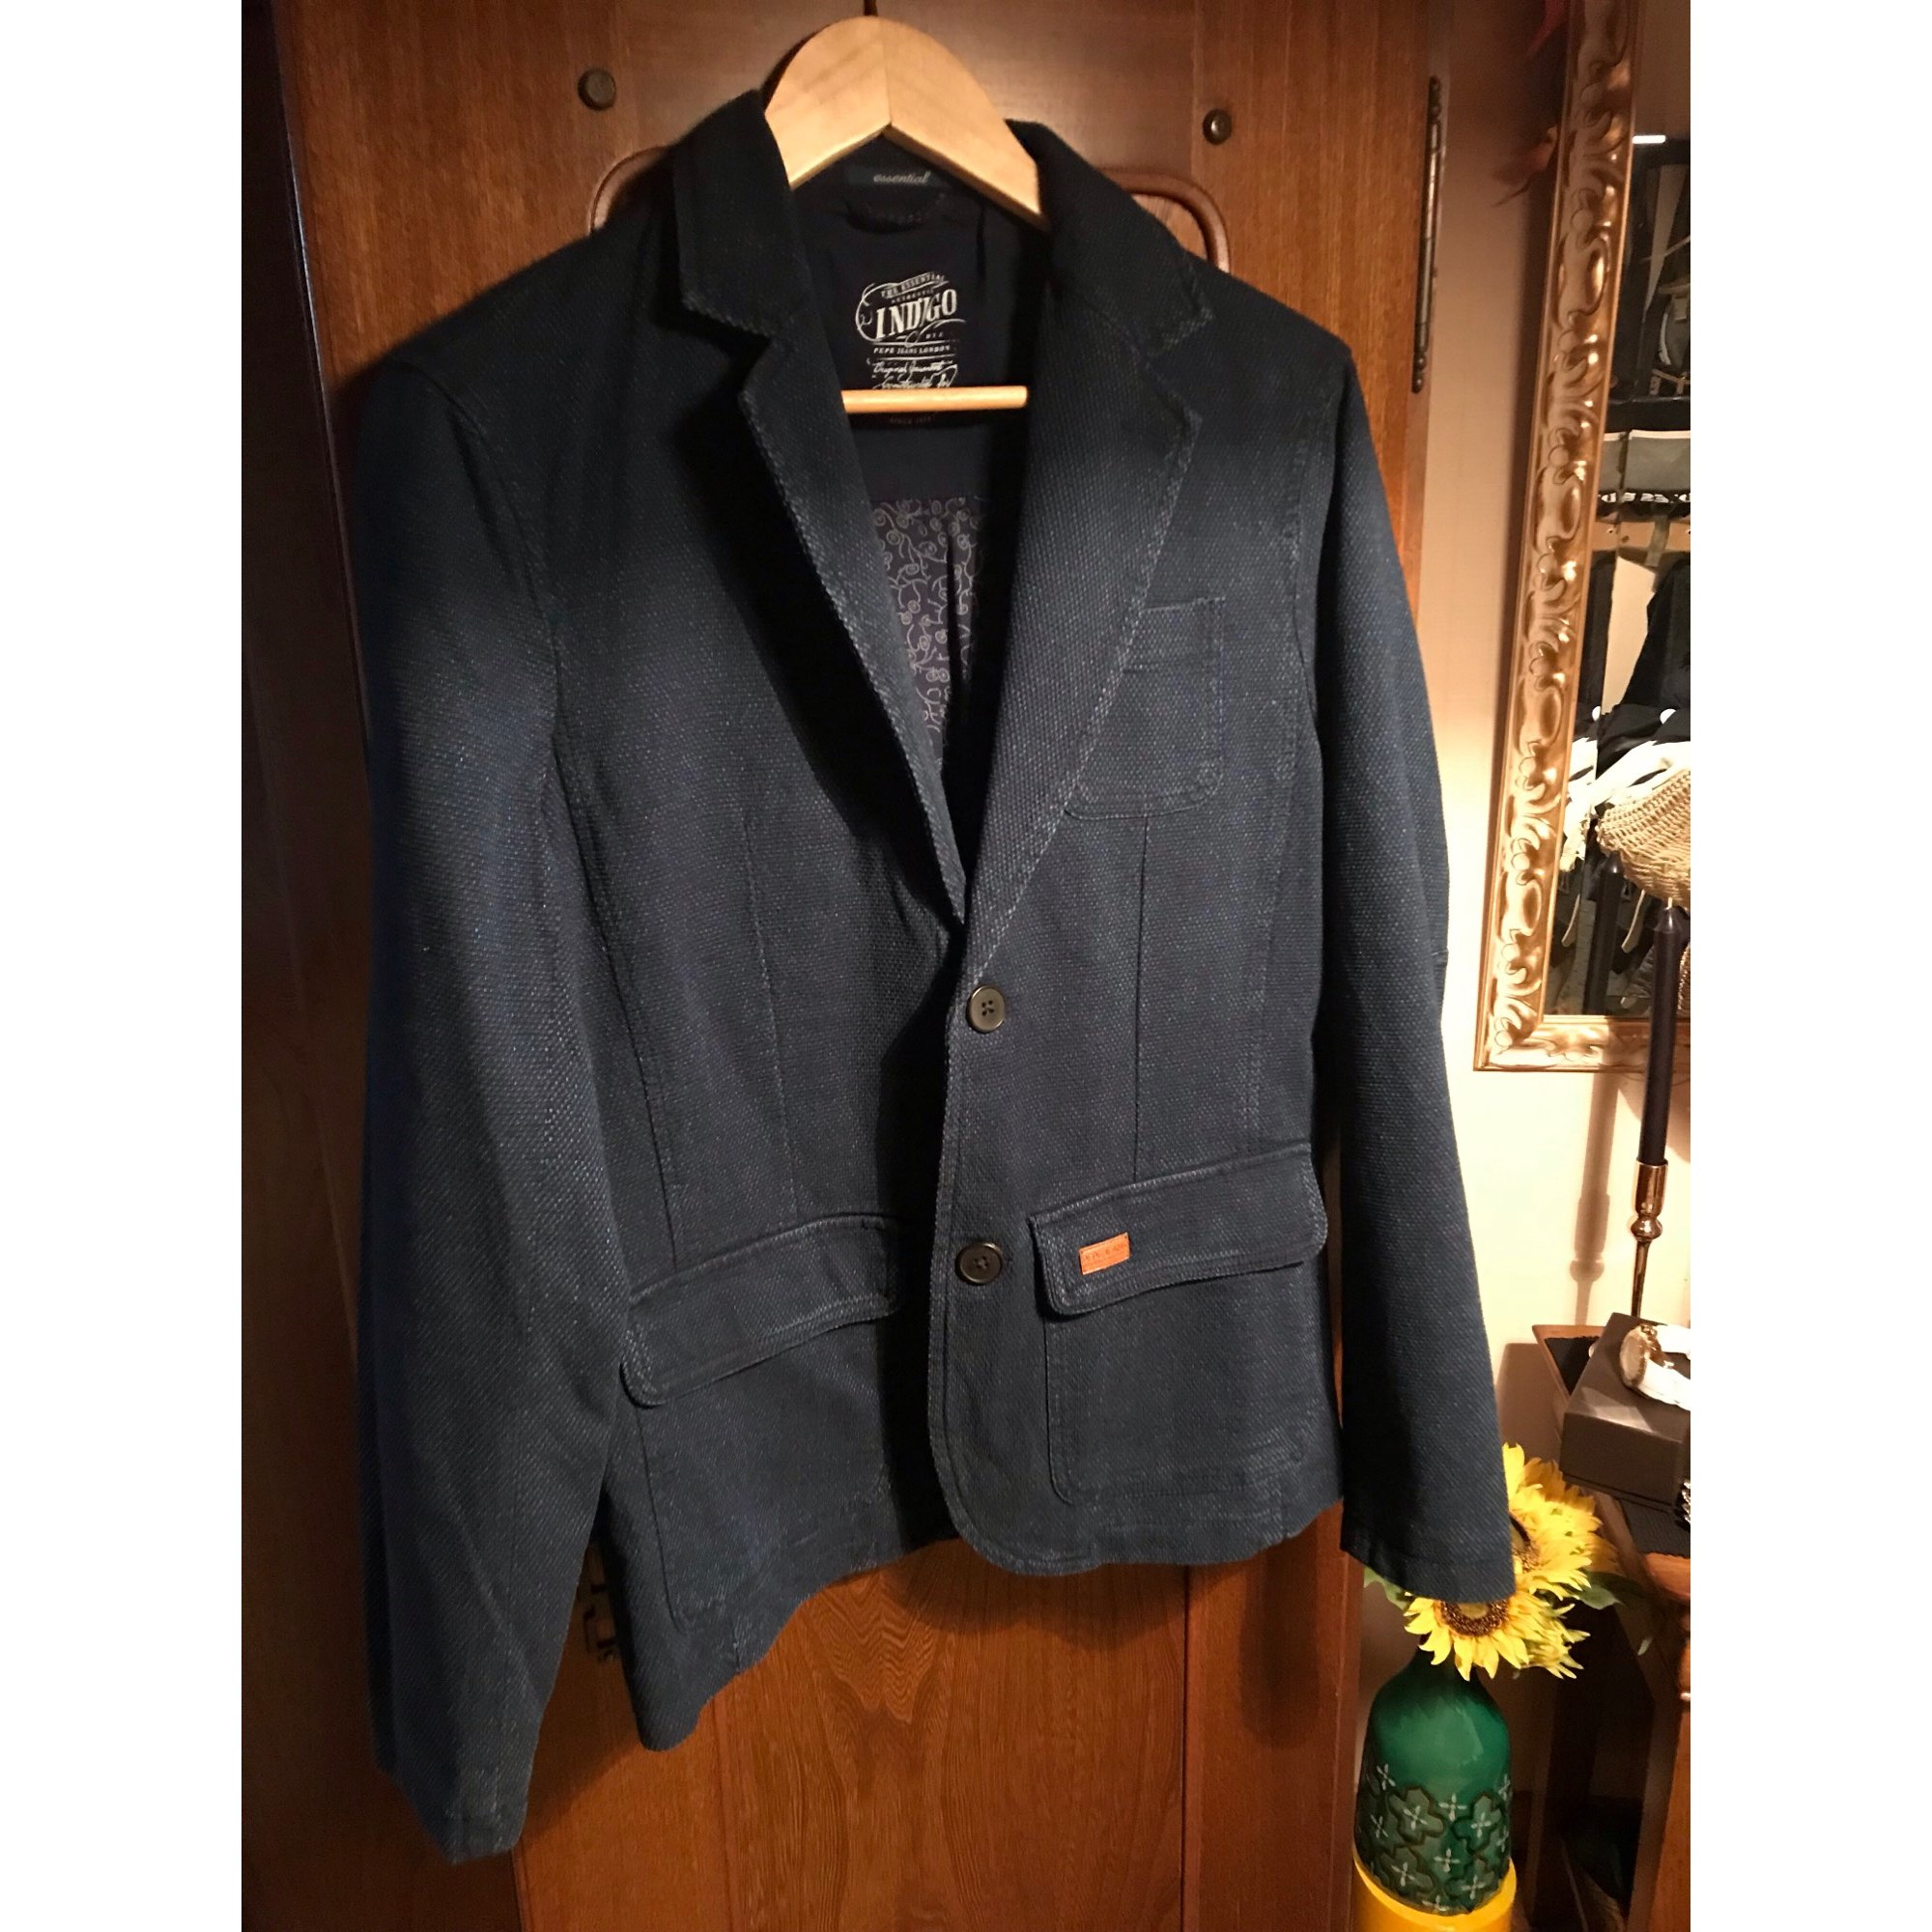 Jeans Veste 8075285 38 Pepe Bleu Hpxp7A1